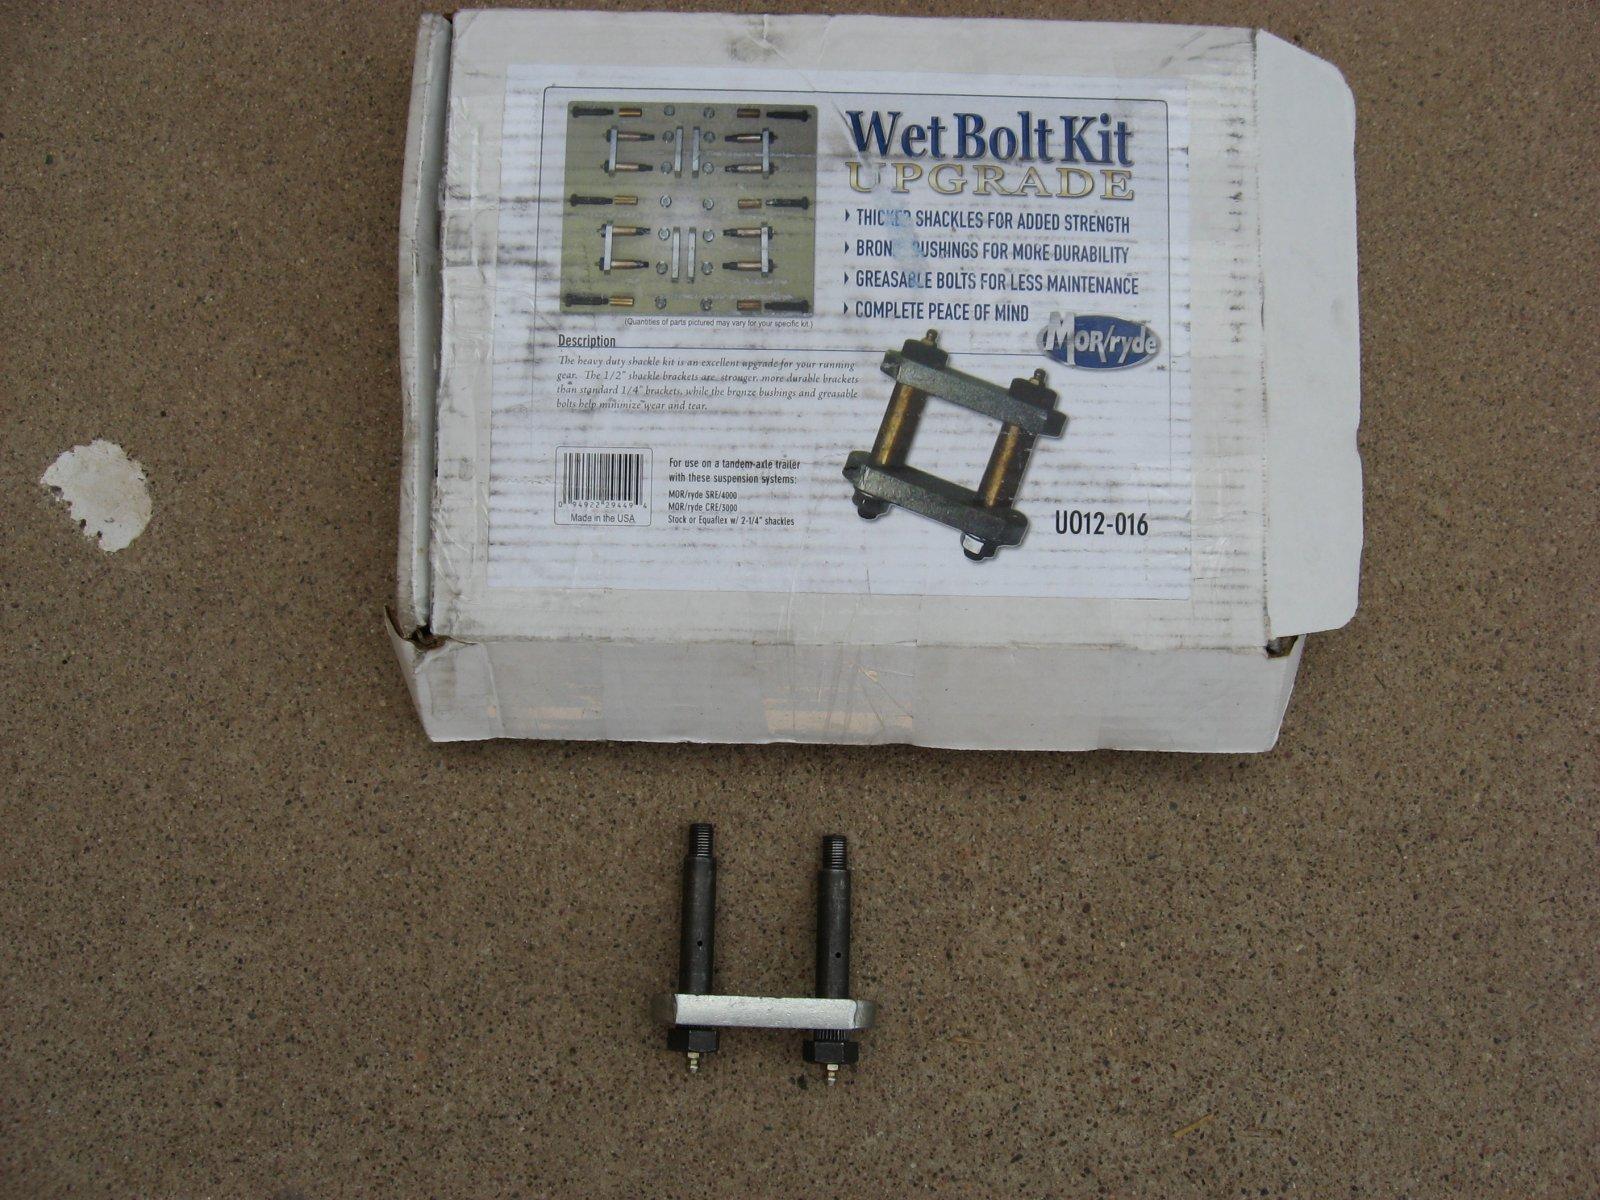 Click image for larger version  Name:Morryde Picture wet bolt kit.jpg Views:71 Size:362.2 KB ID:68309